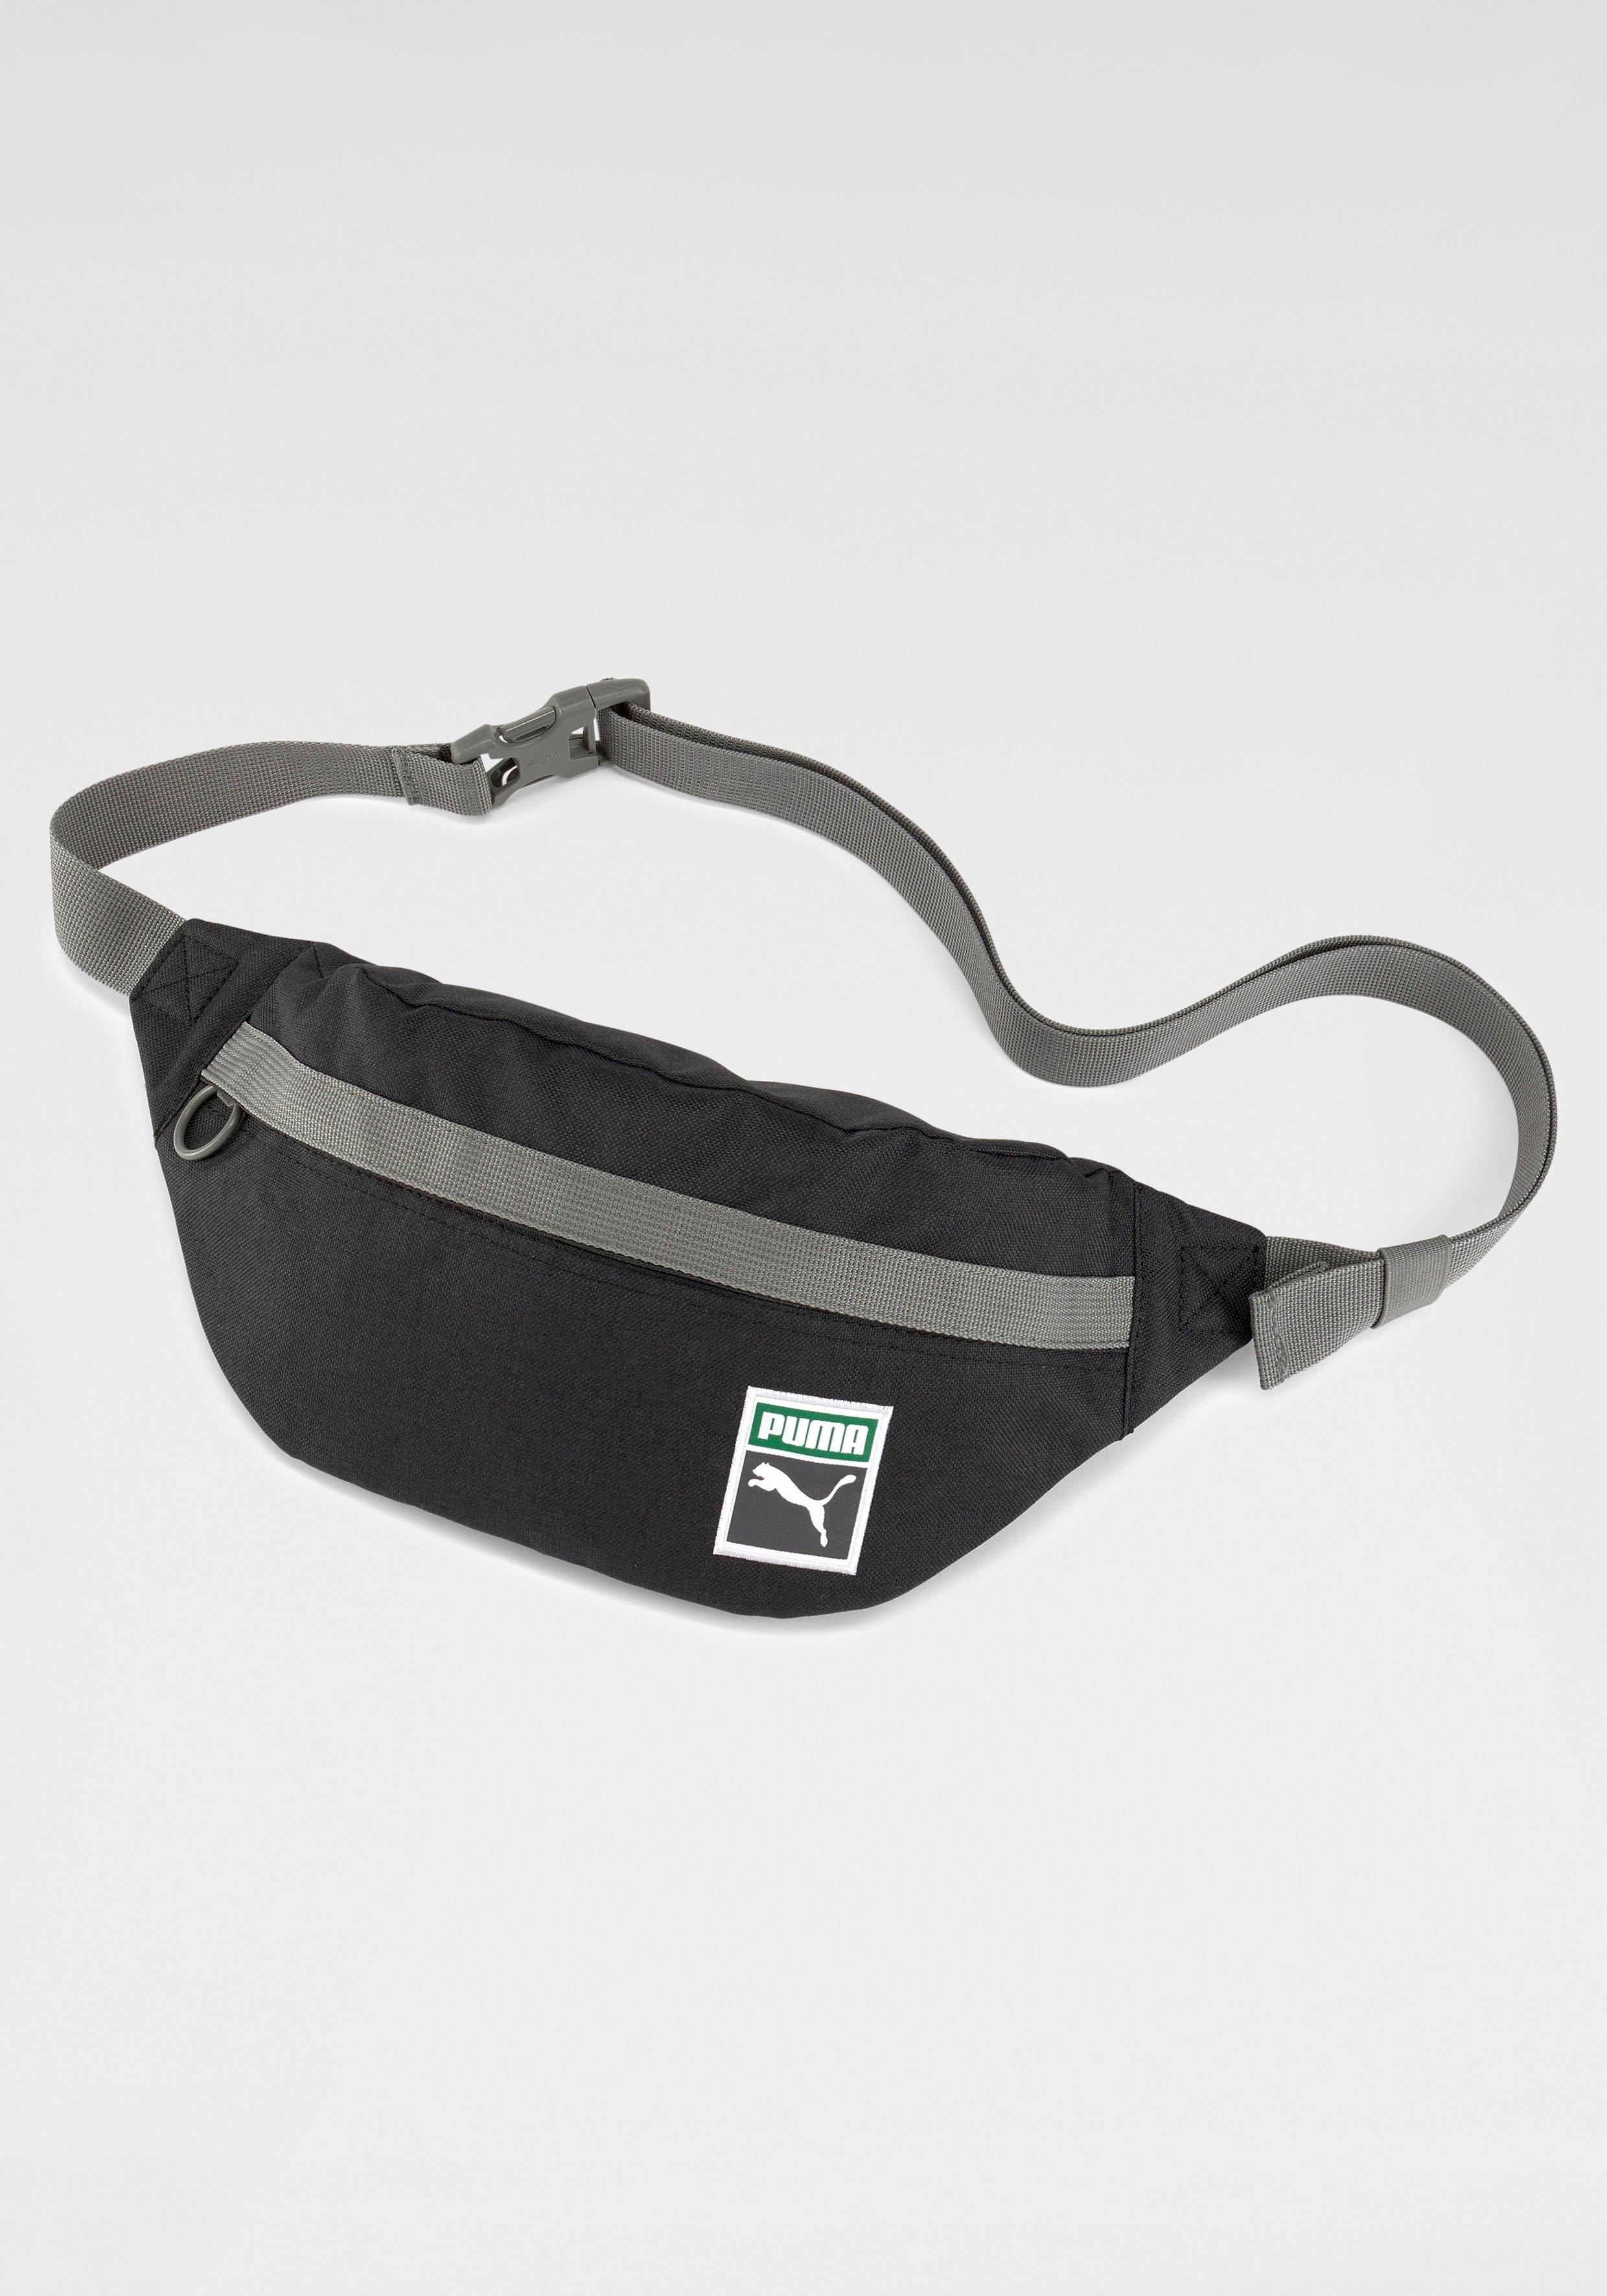 PUMA heuptasje »Originals Waist Bag Retro« nu online bestellen